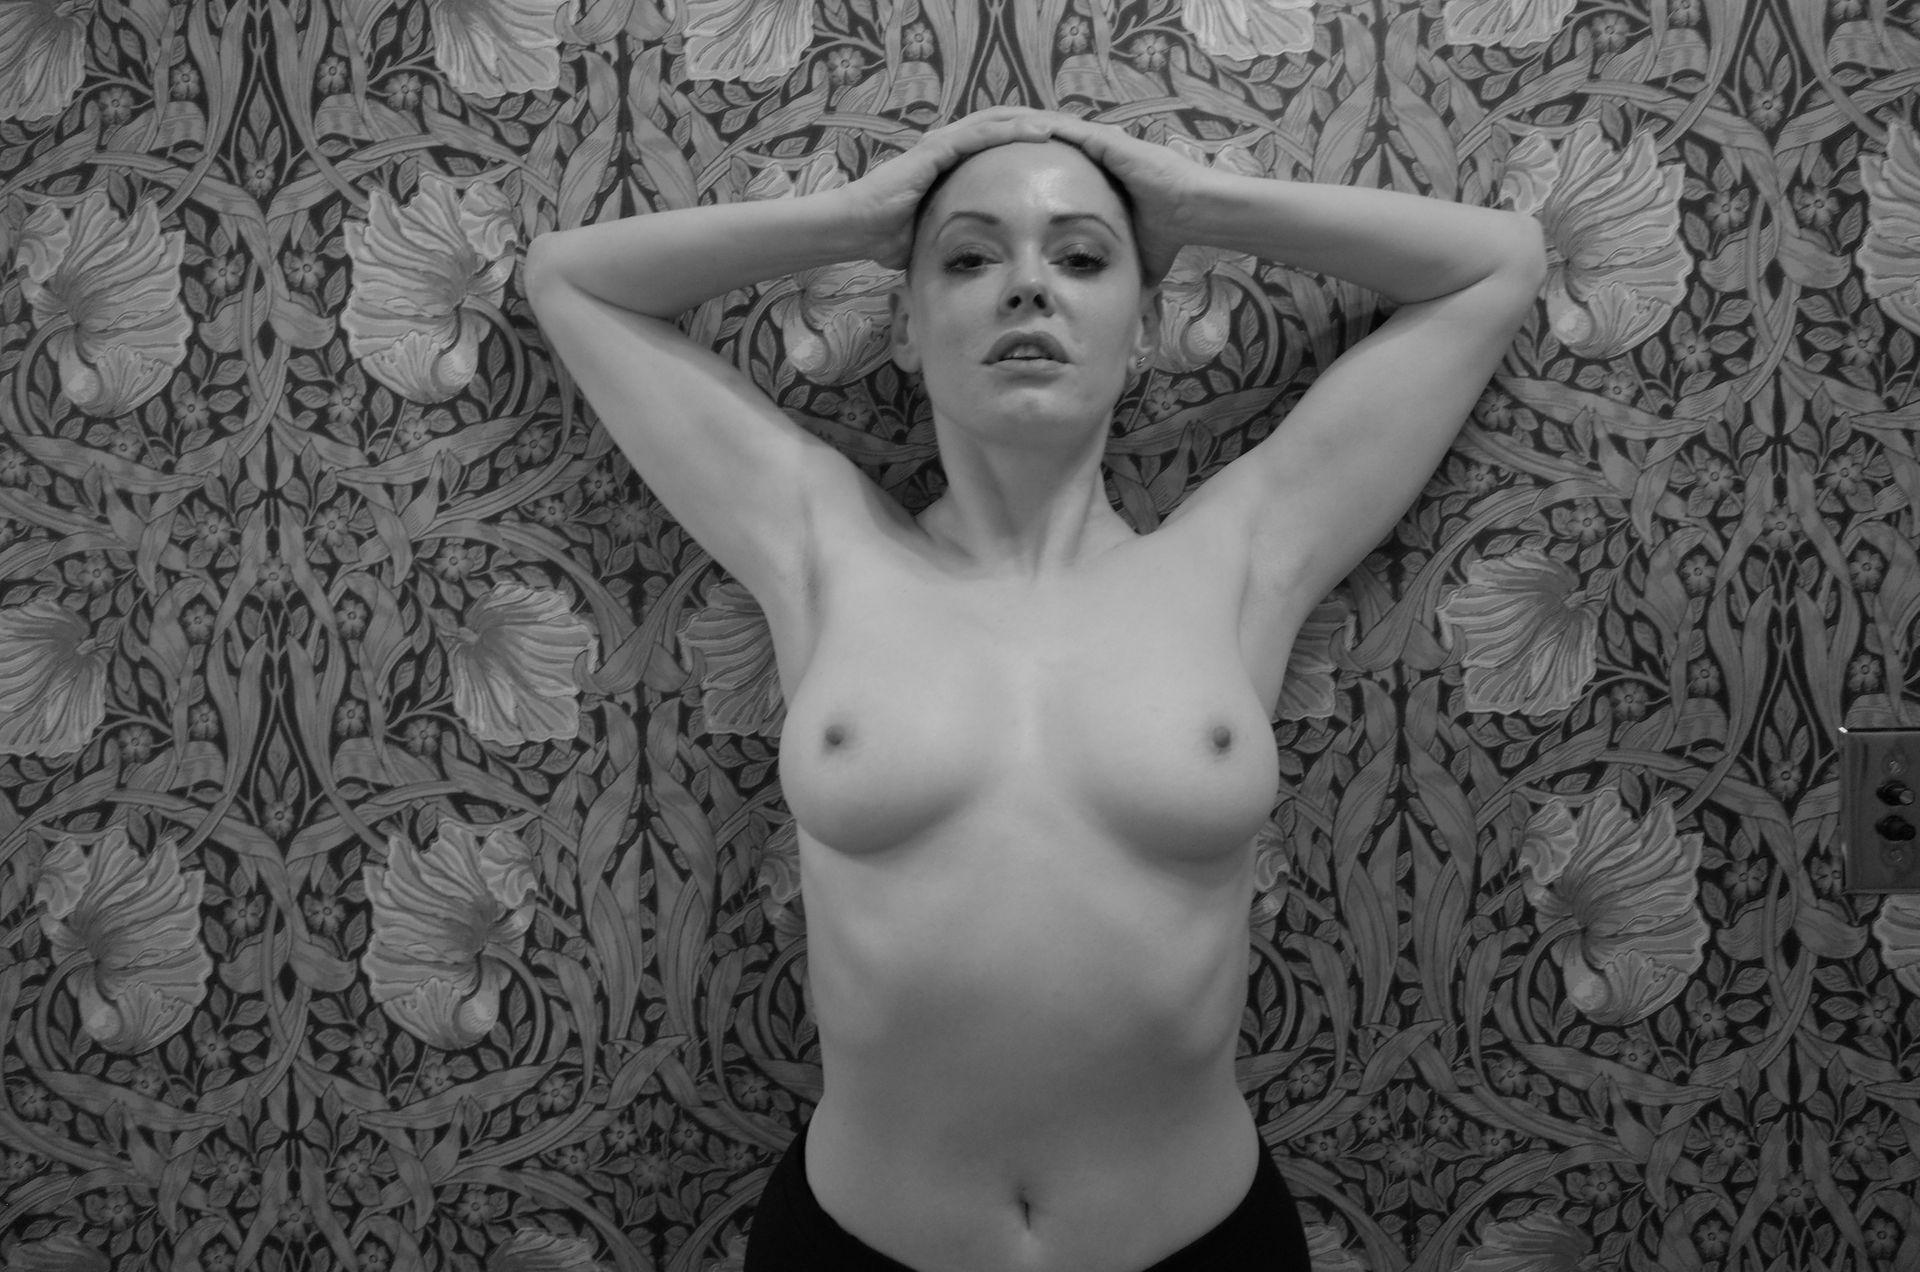 Rose mcgowan hot naked